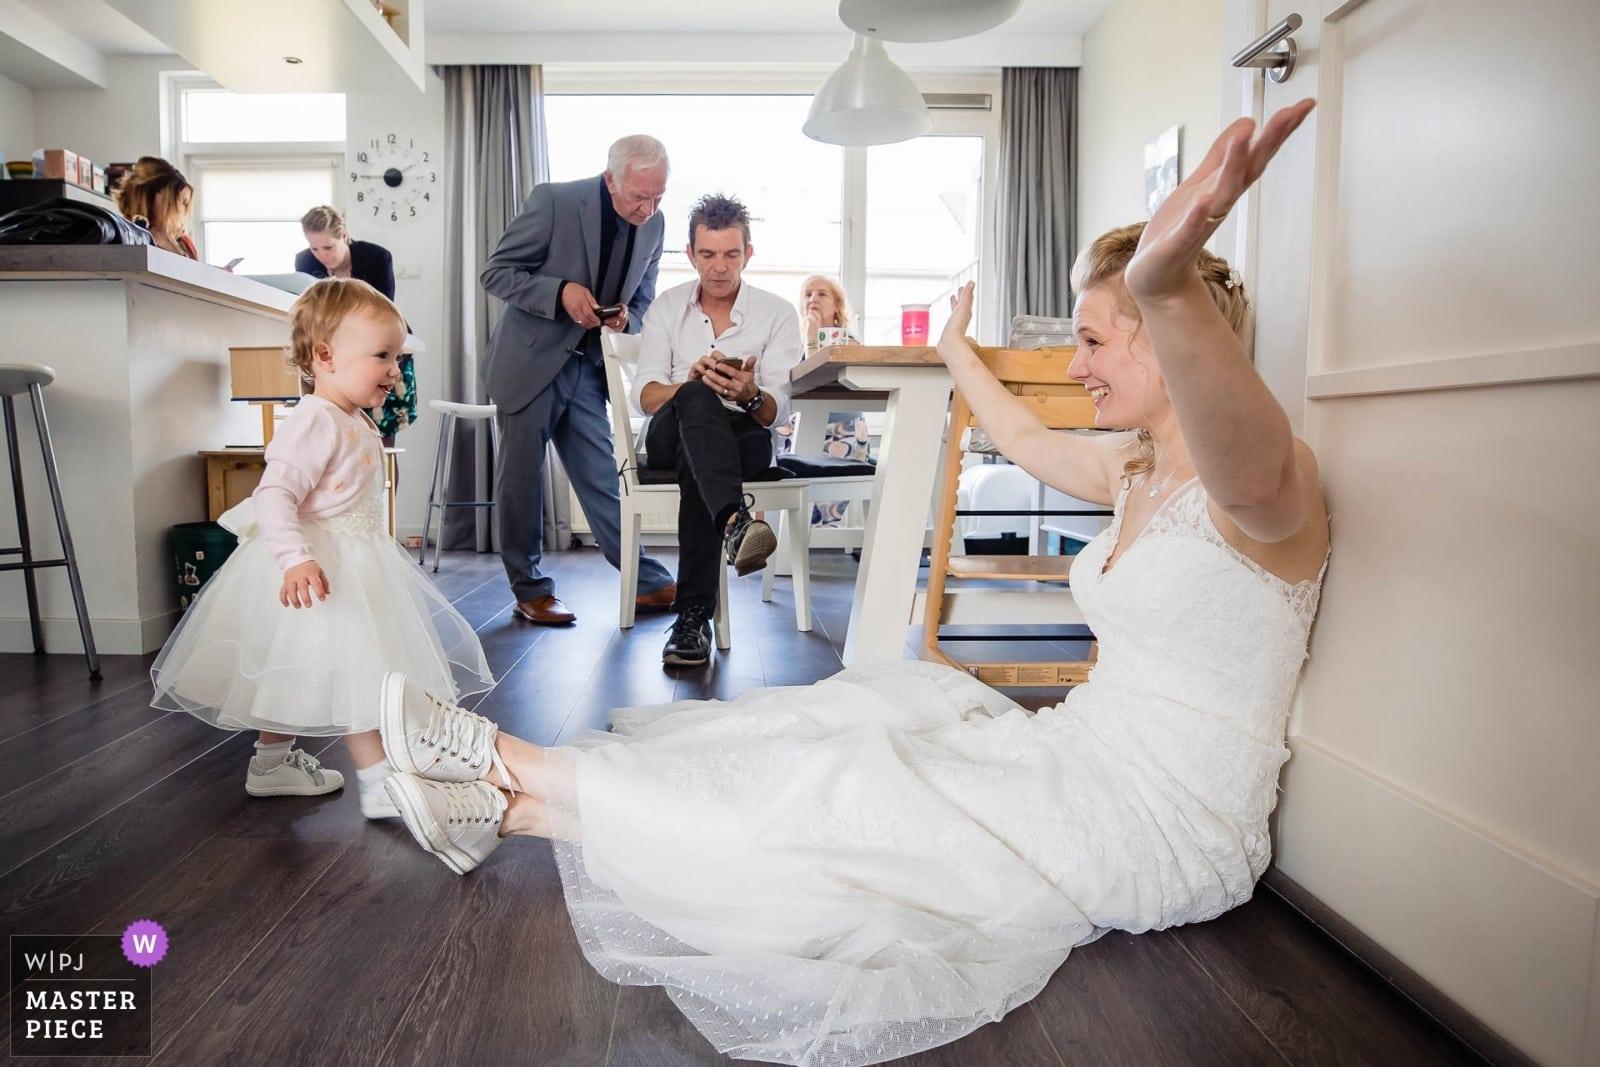 2019v09 wedding-photographer-2536521